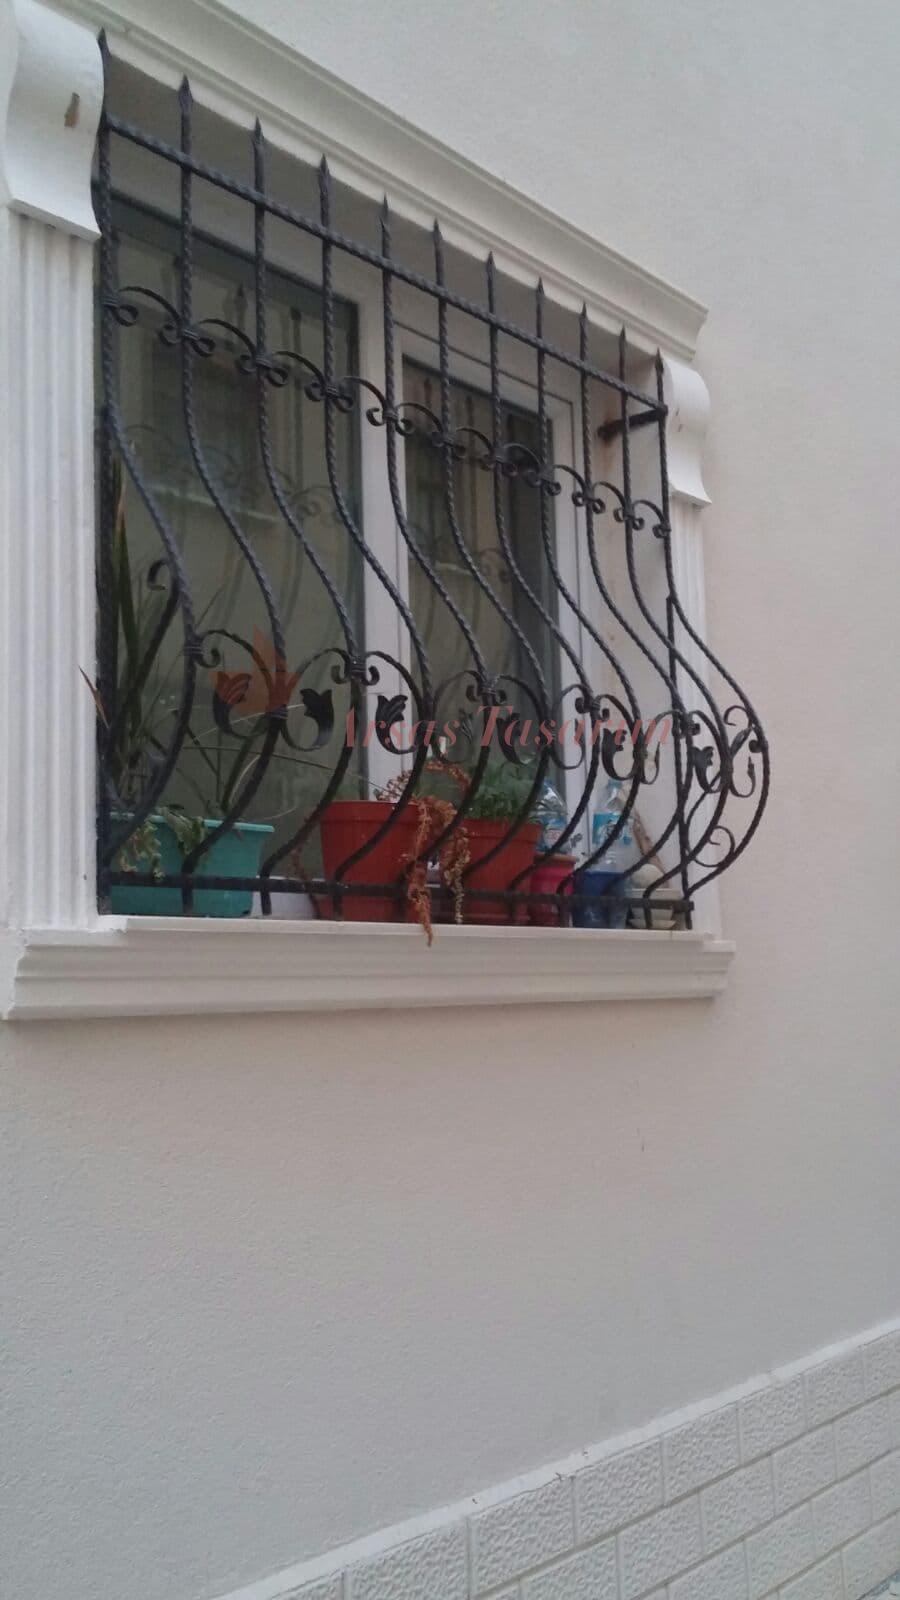 pencere demiri 2